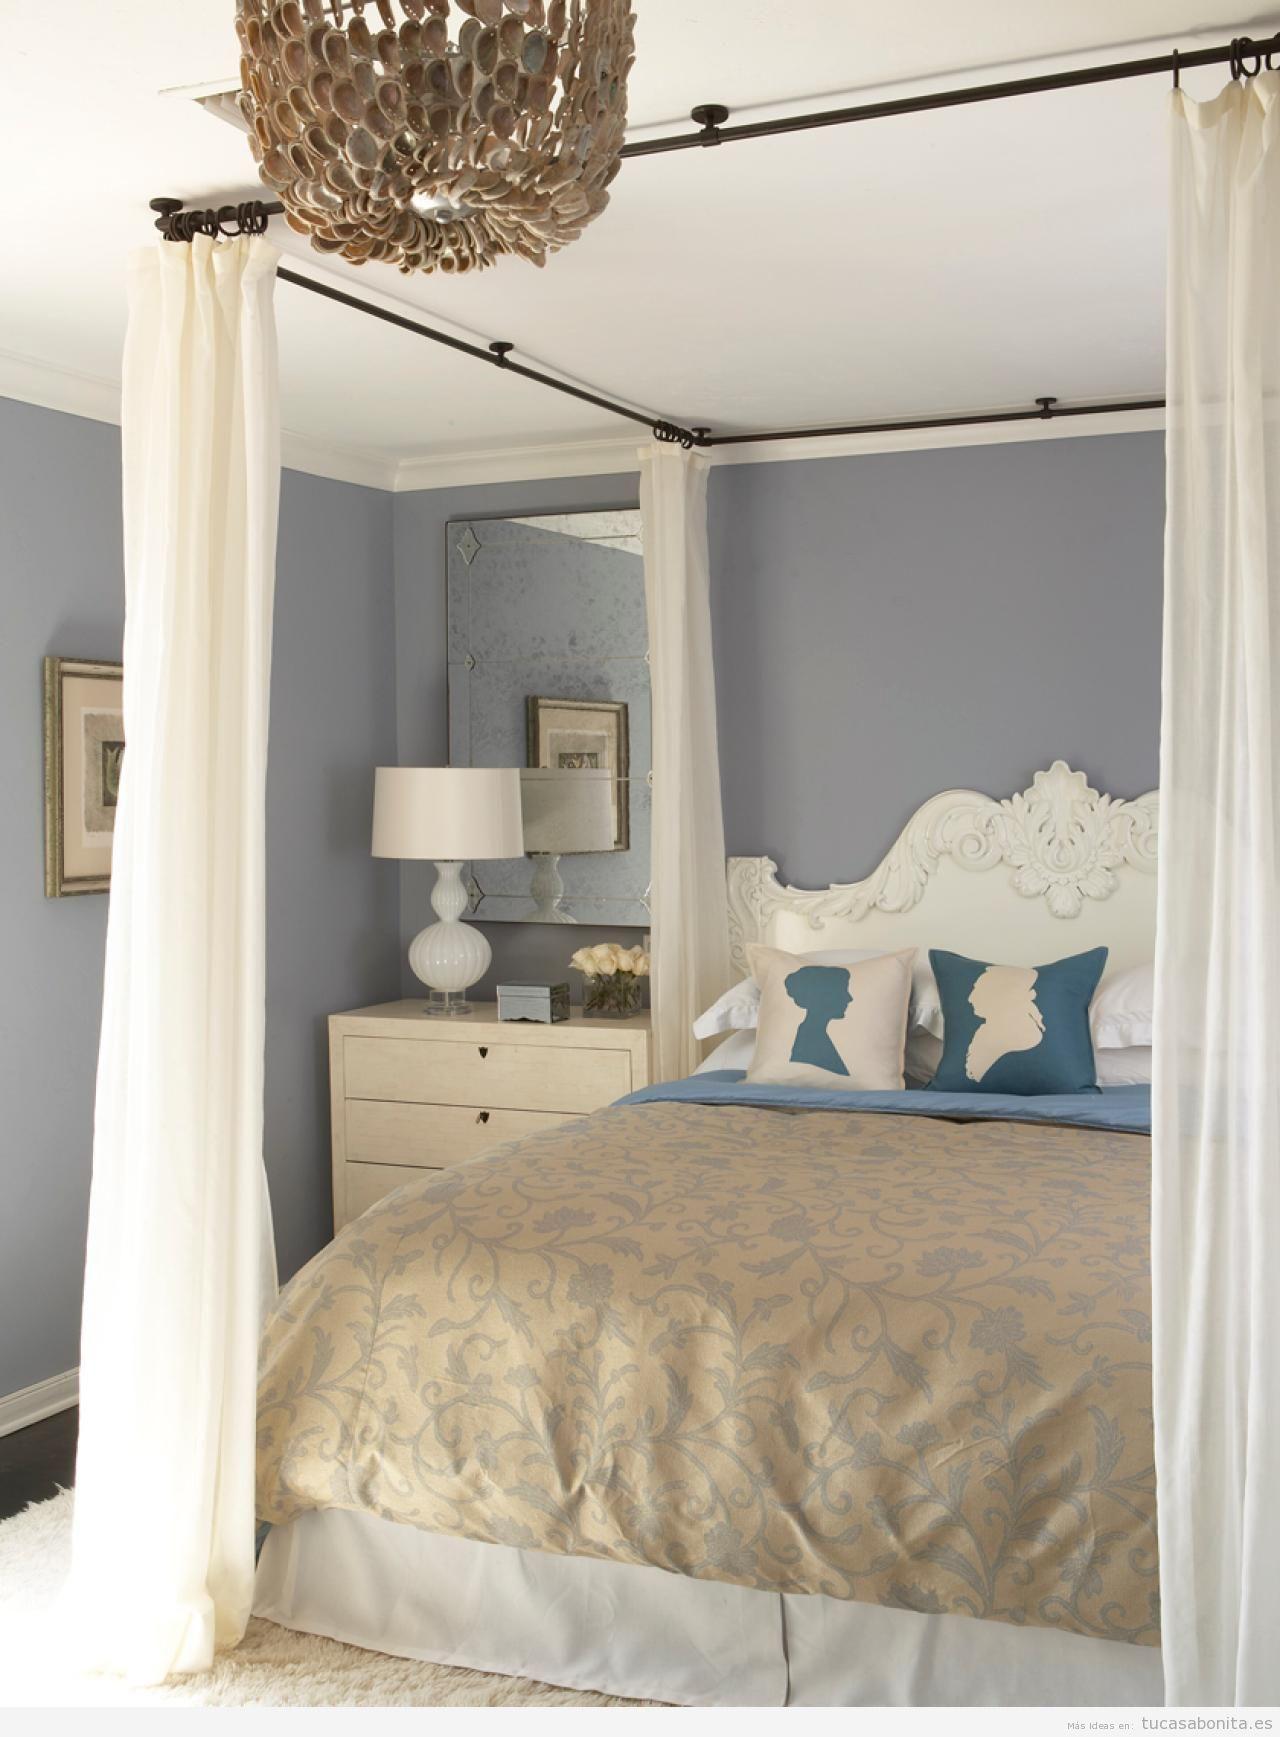 Ideas decorar dormitorio matrimonio distintos estilos